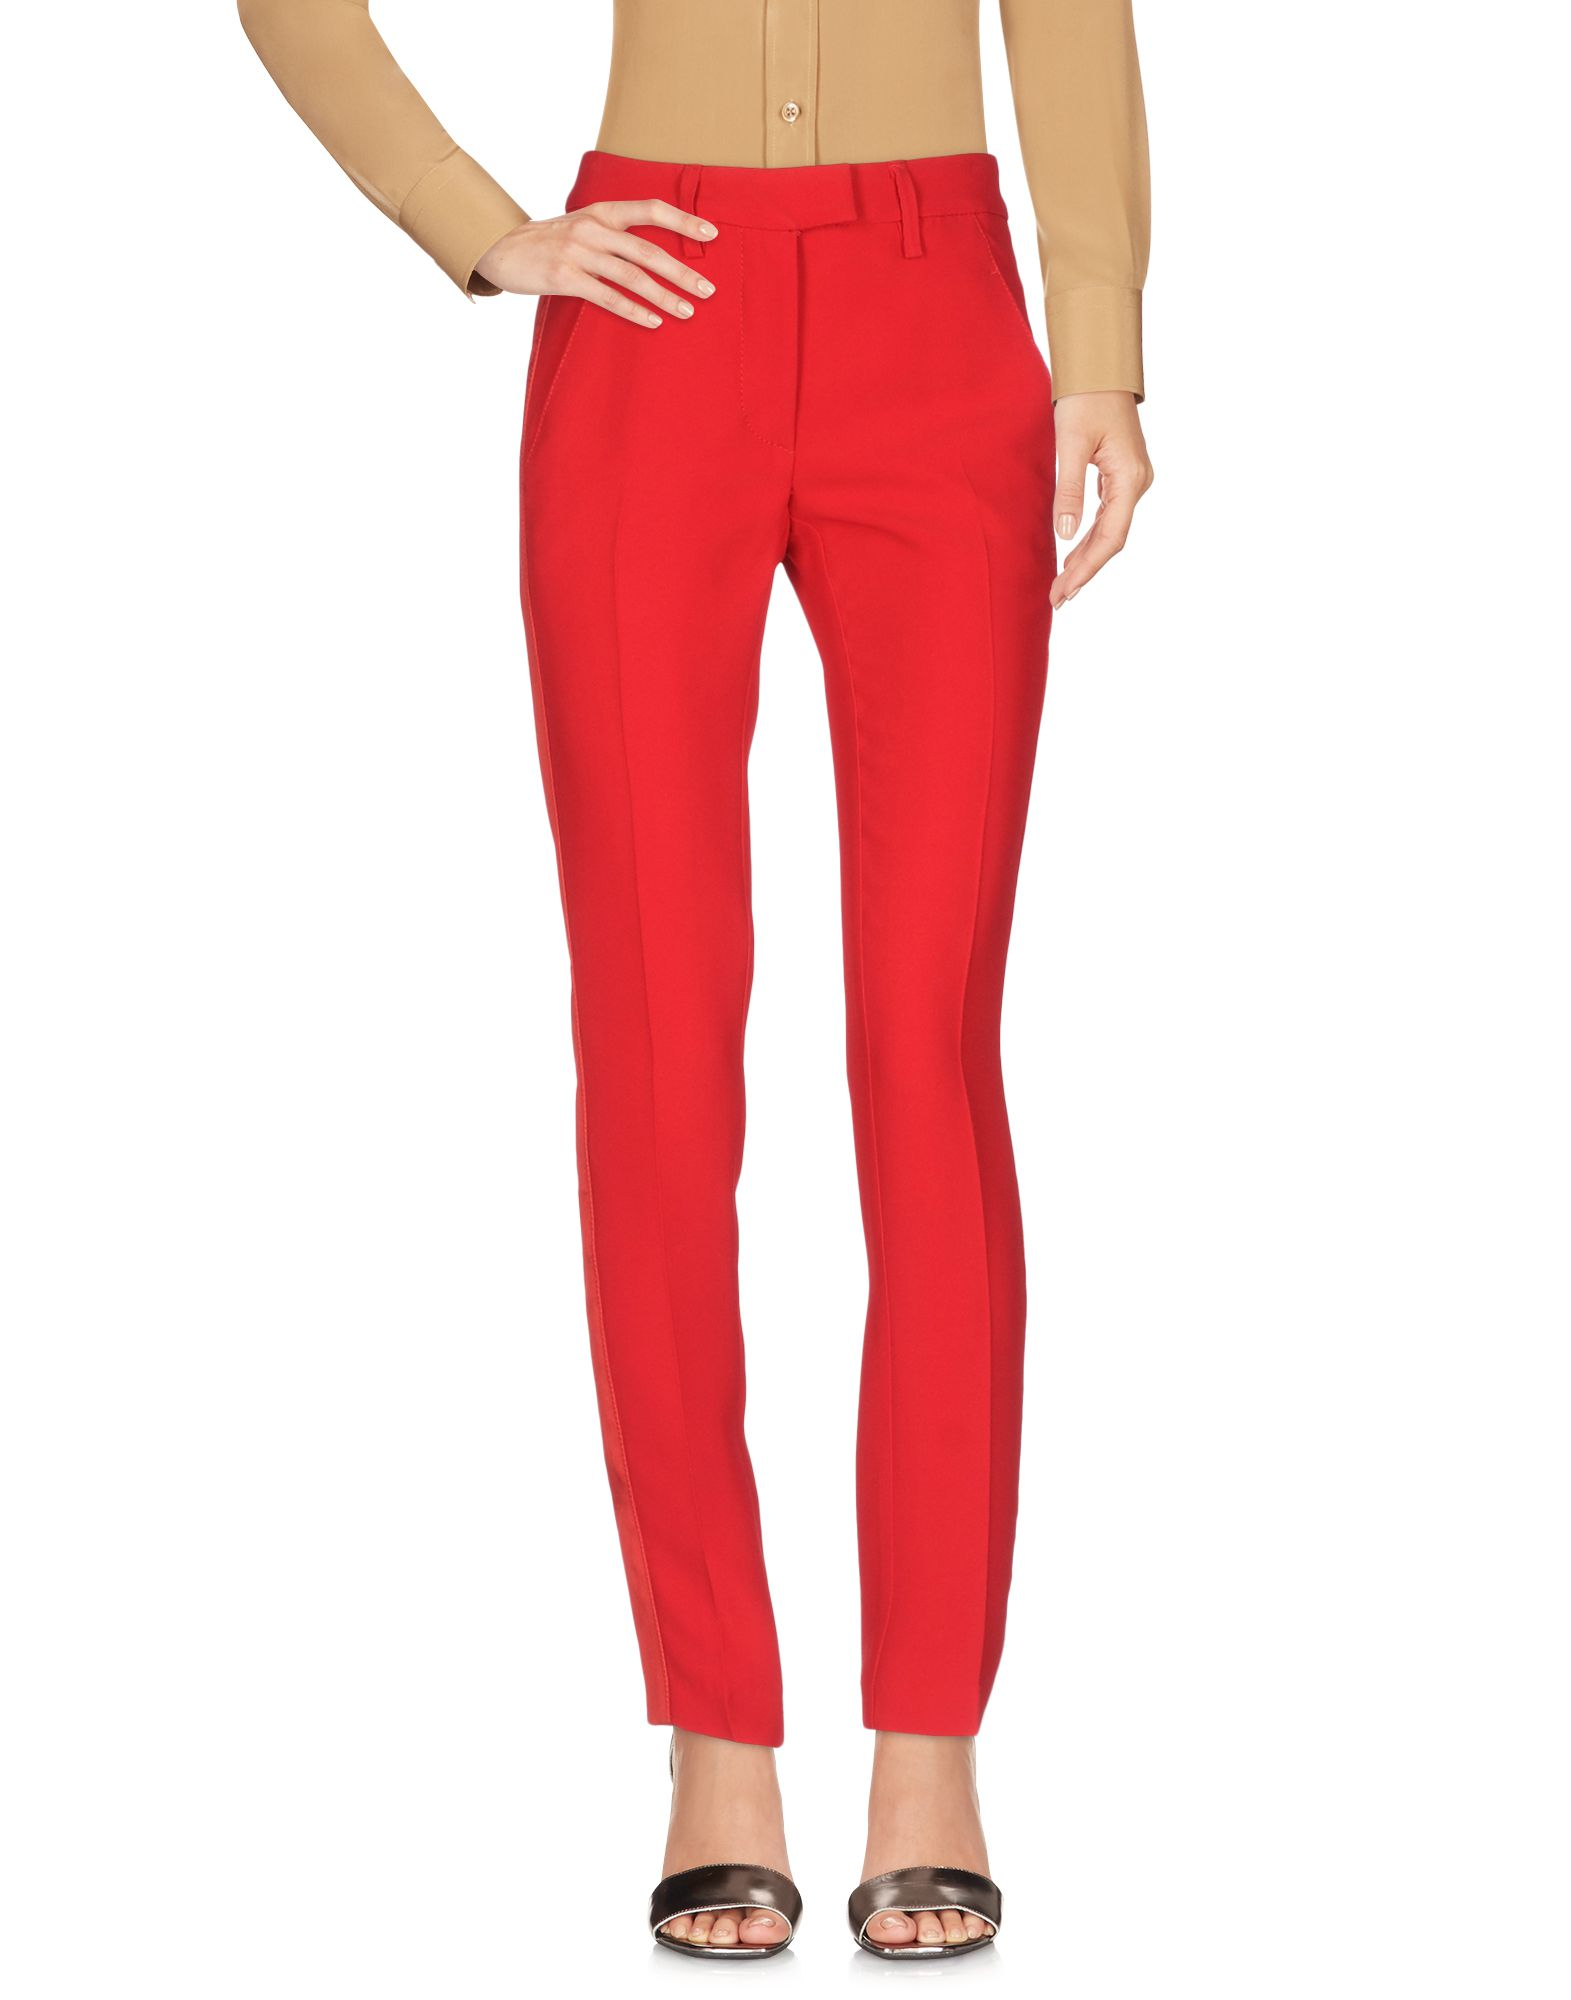 Pantalone Dondup Donna - Acquista online su 7X2FjtboGv